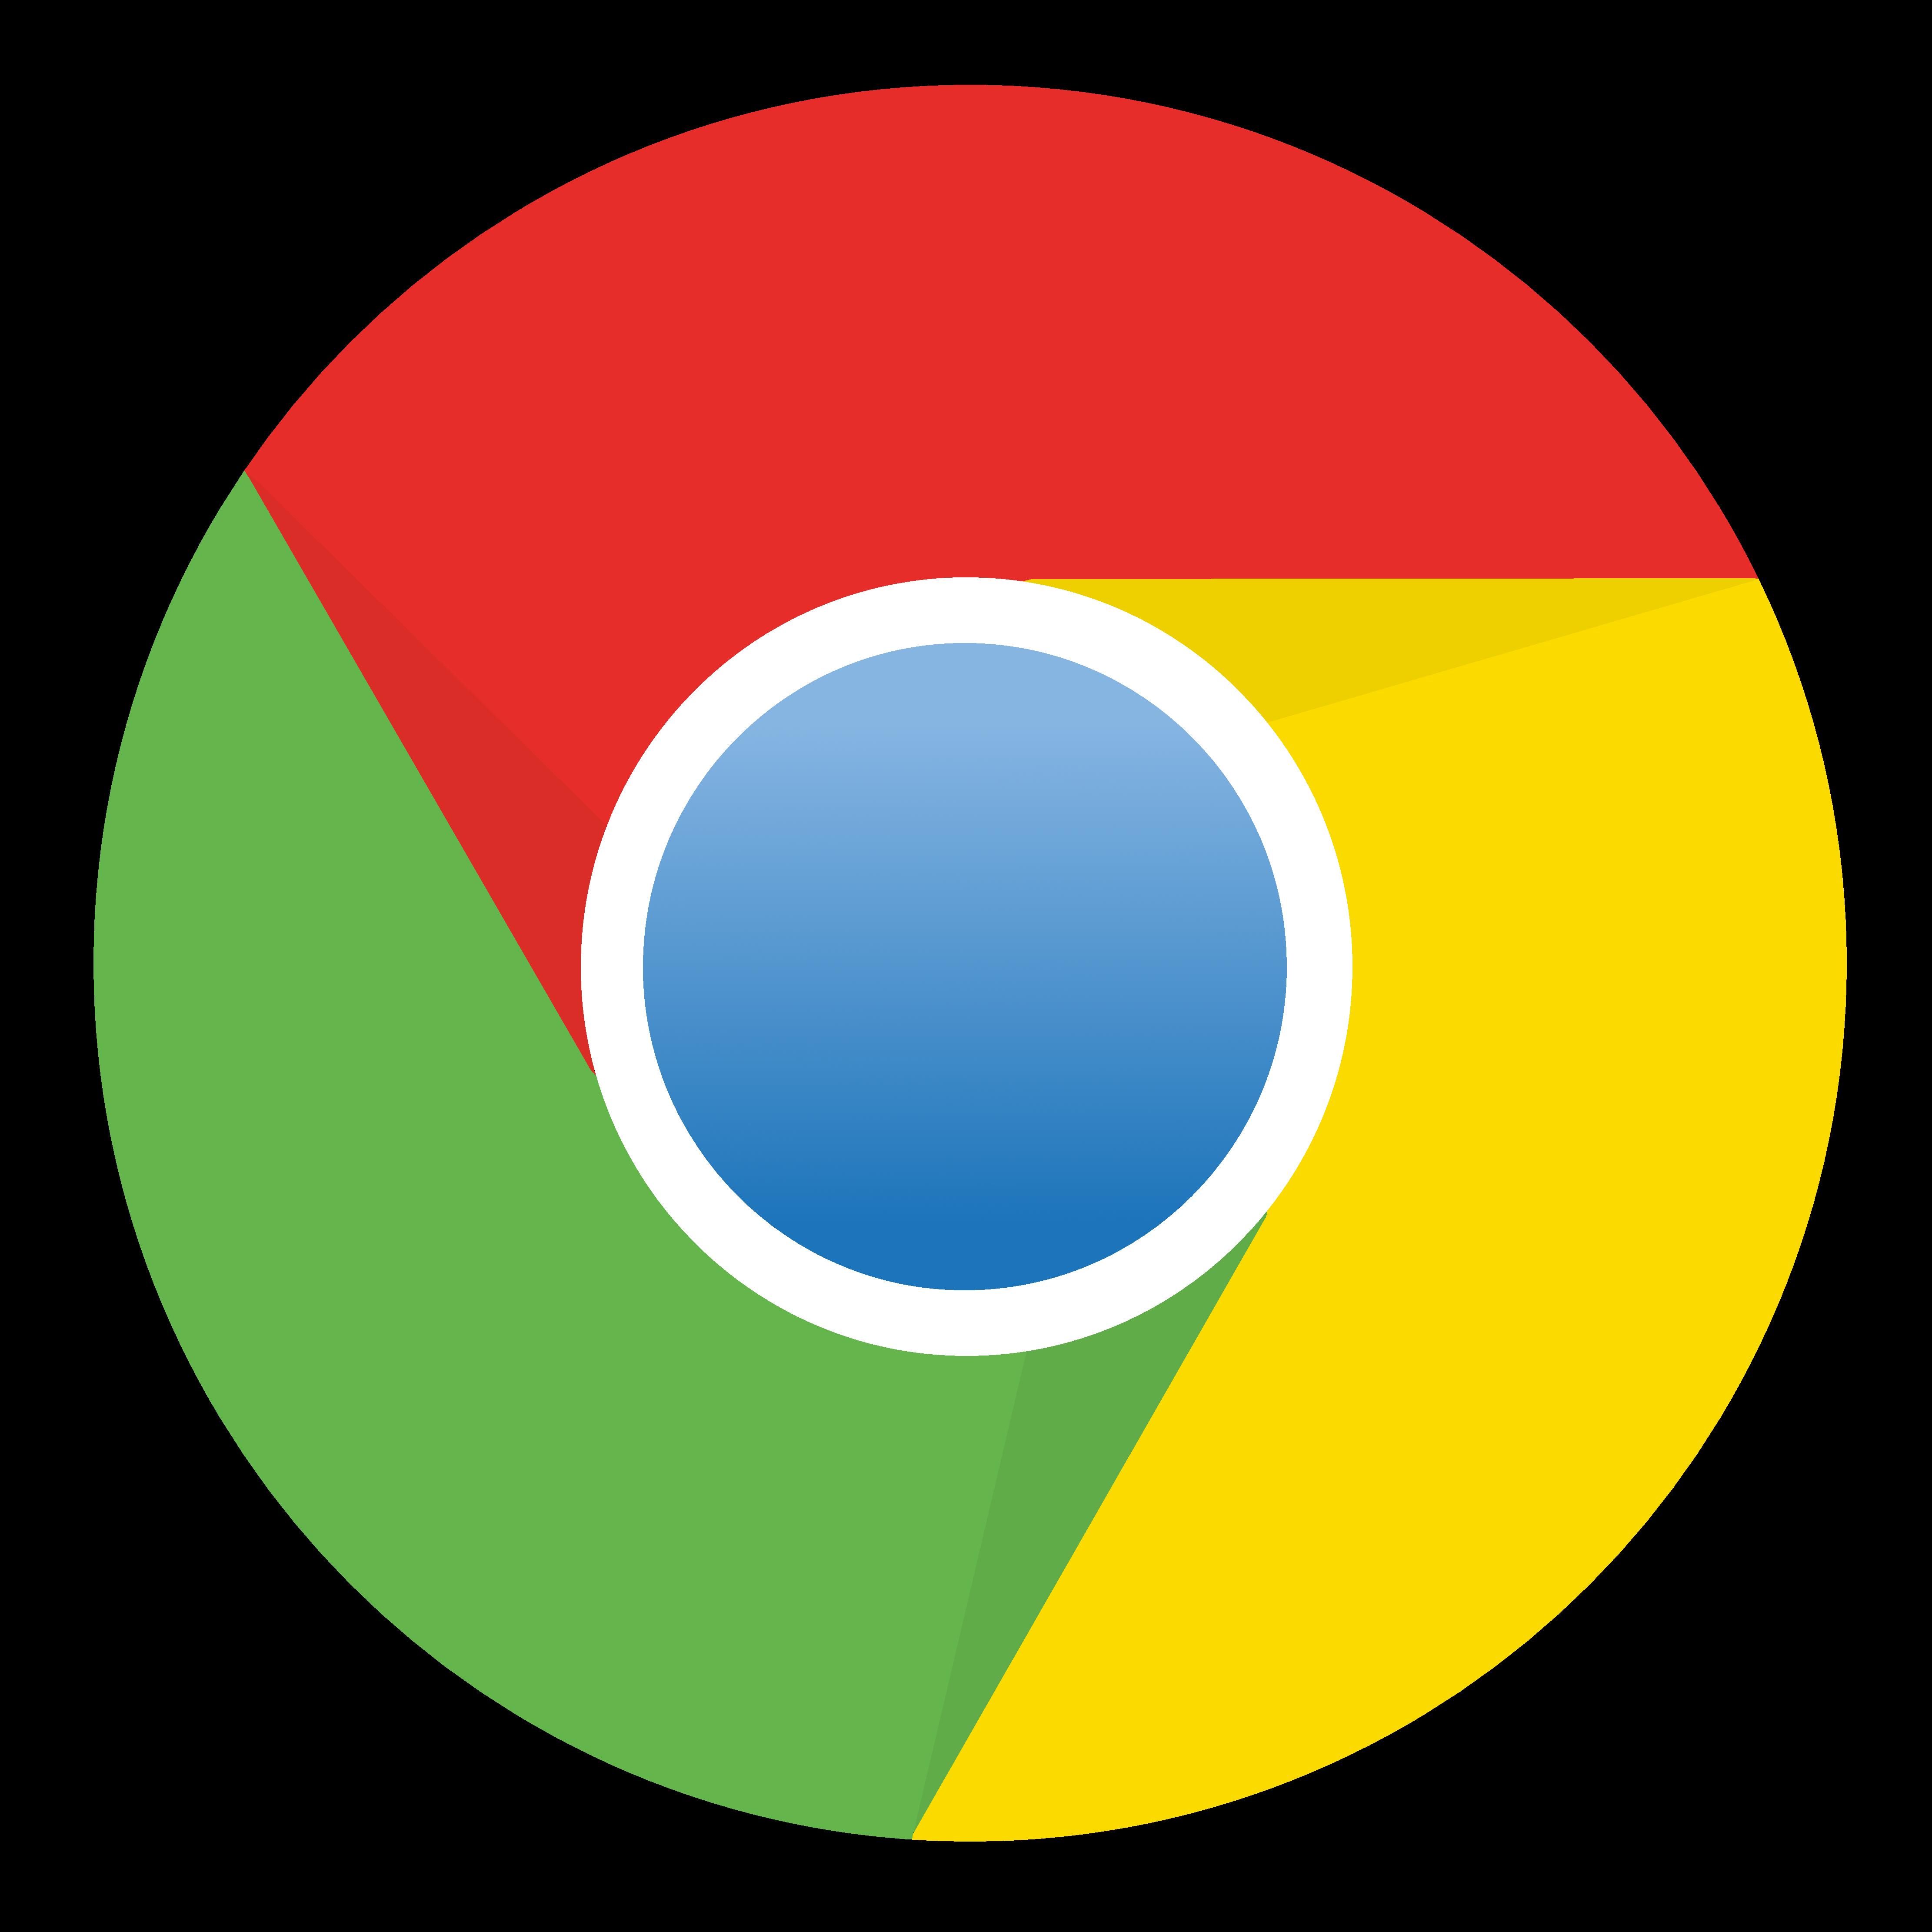 Google Chrome Logo Vector PNG Transparent Google Chrome ... - Chrome Logo Transparent